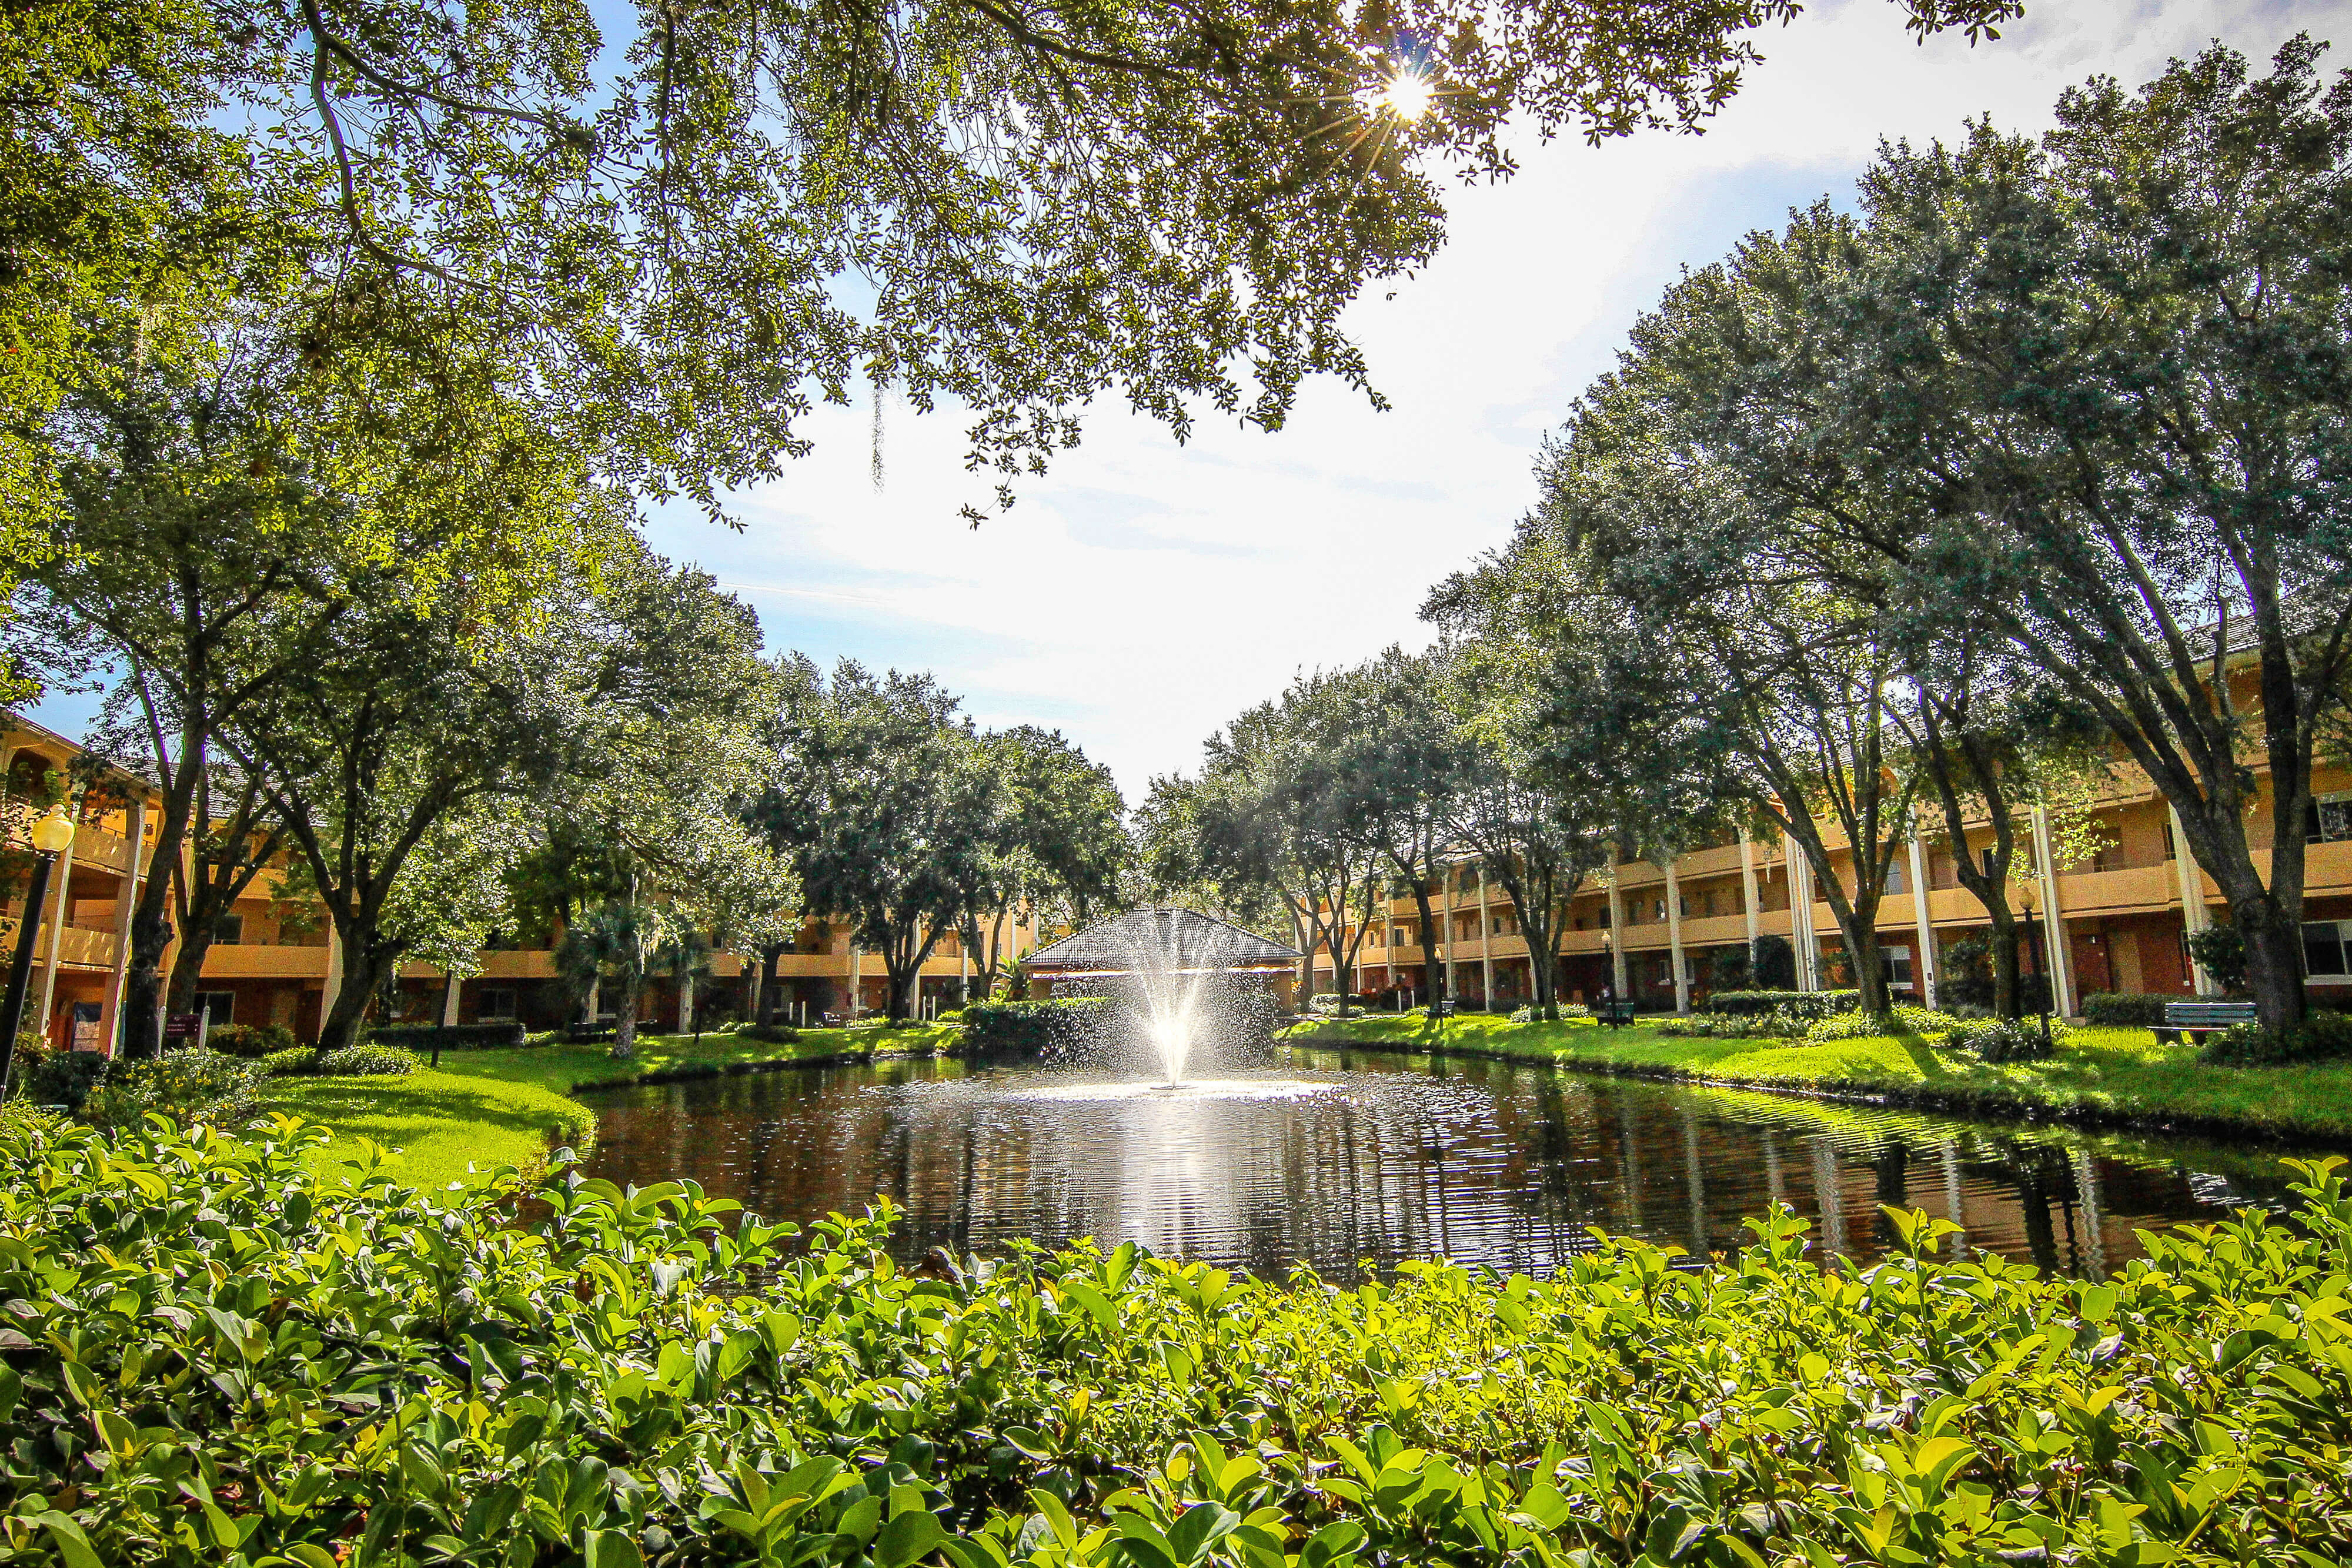 View of one of our leisure hotels near Seaworld Orlando FL | Westgate Leisure Resort | Westgate Resorts